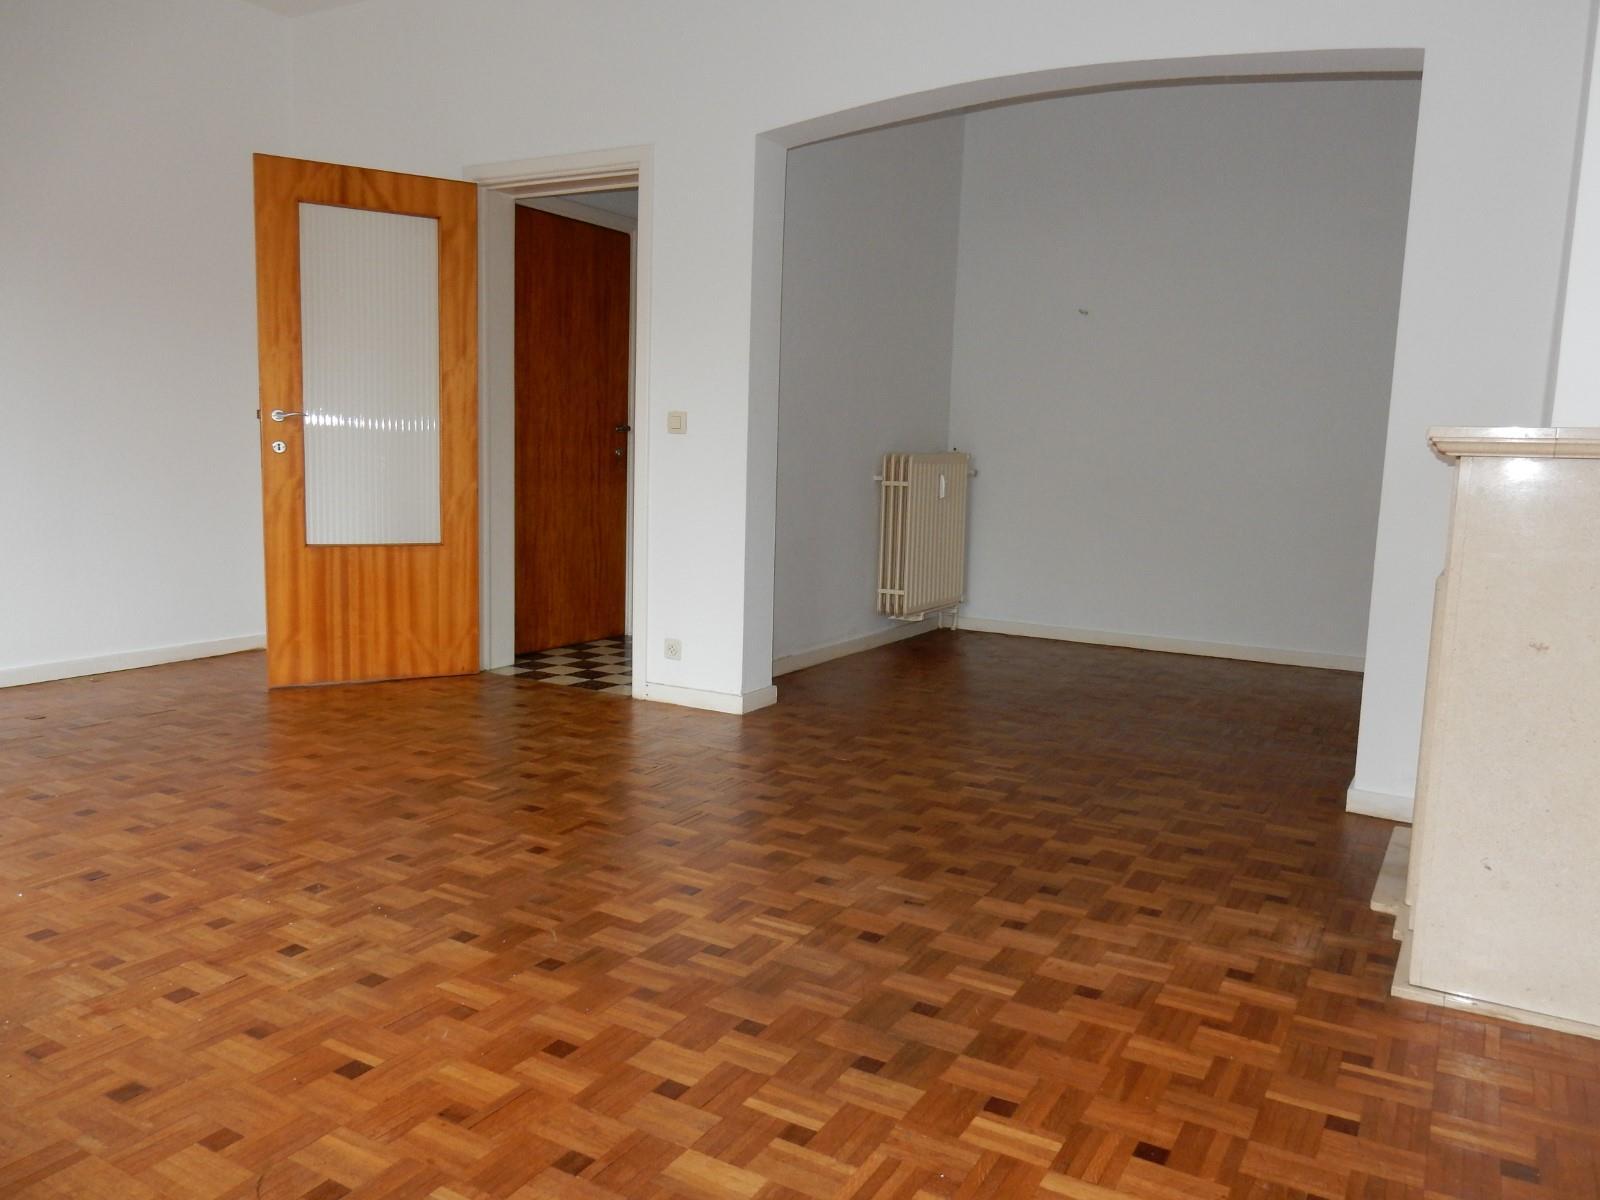 Appartement - Woluwe-Saint-Lambert - #3033017-2